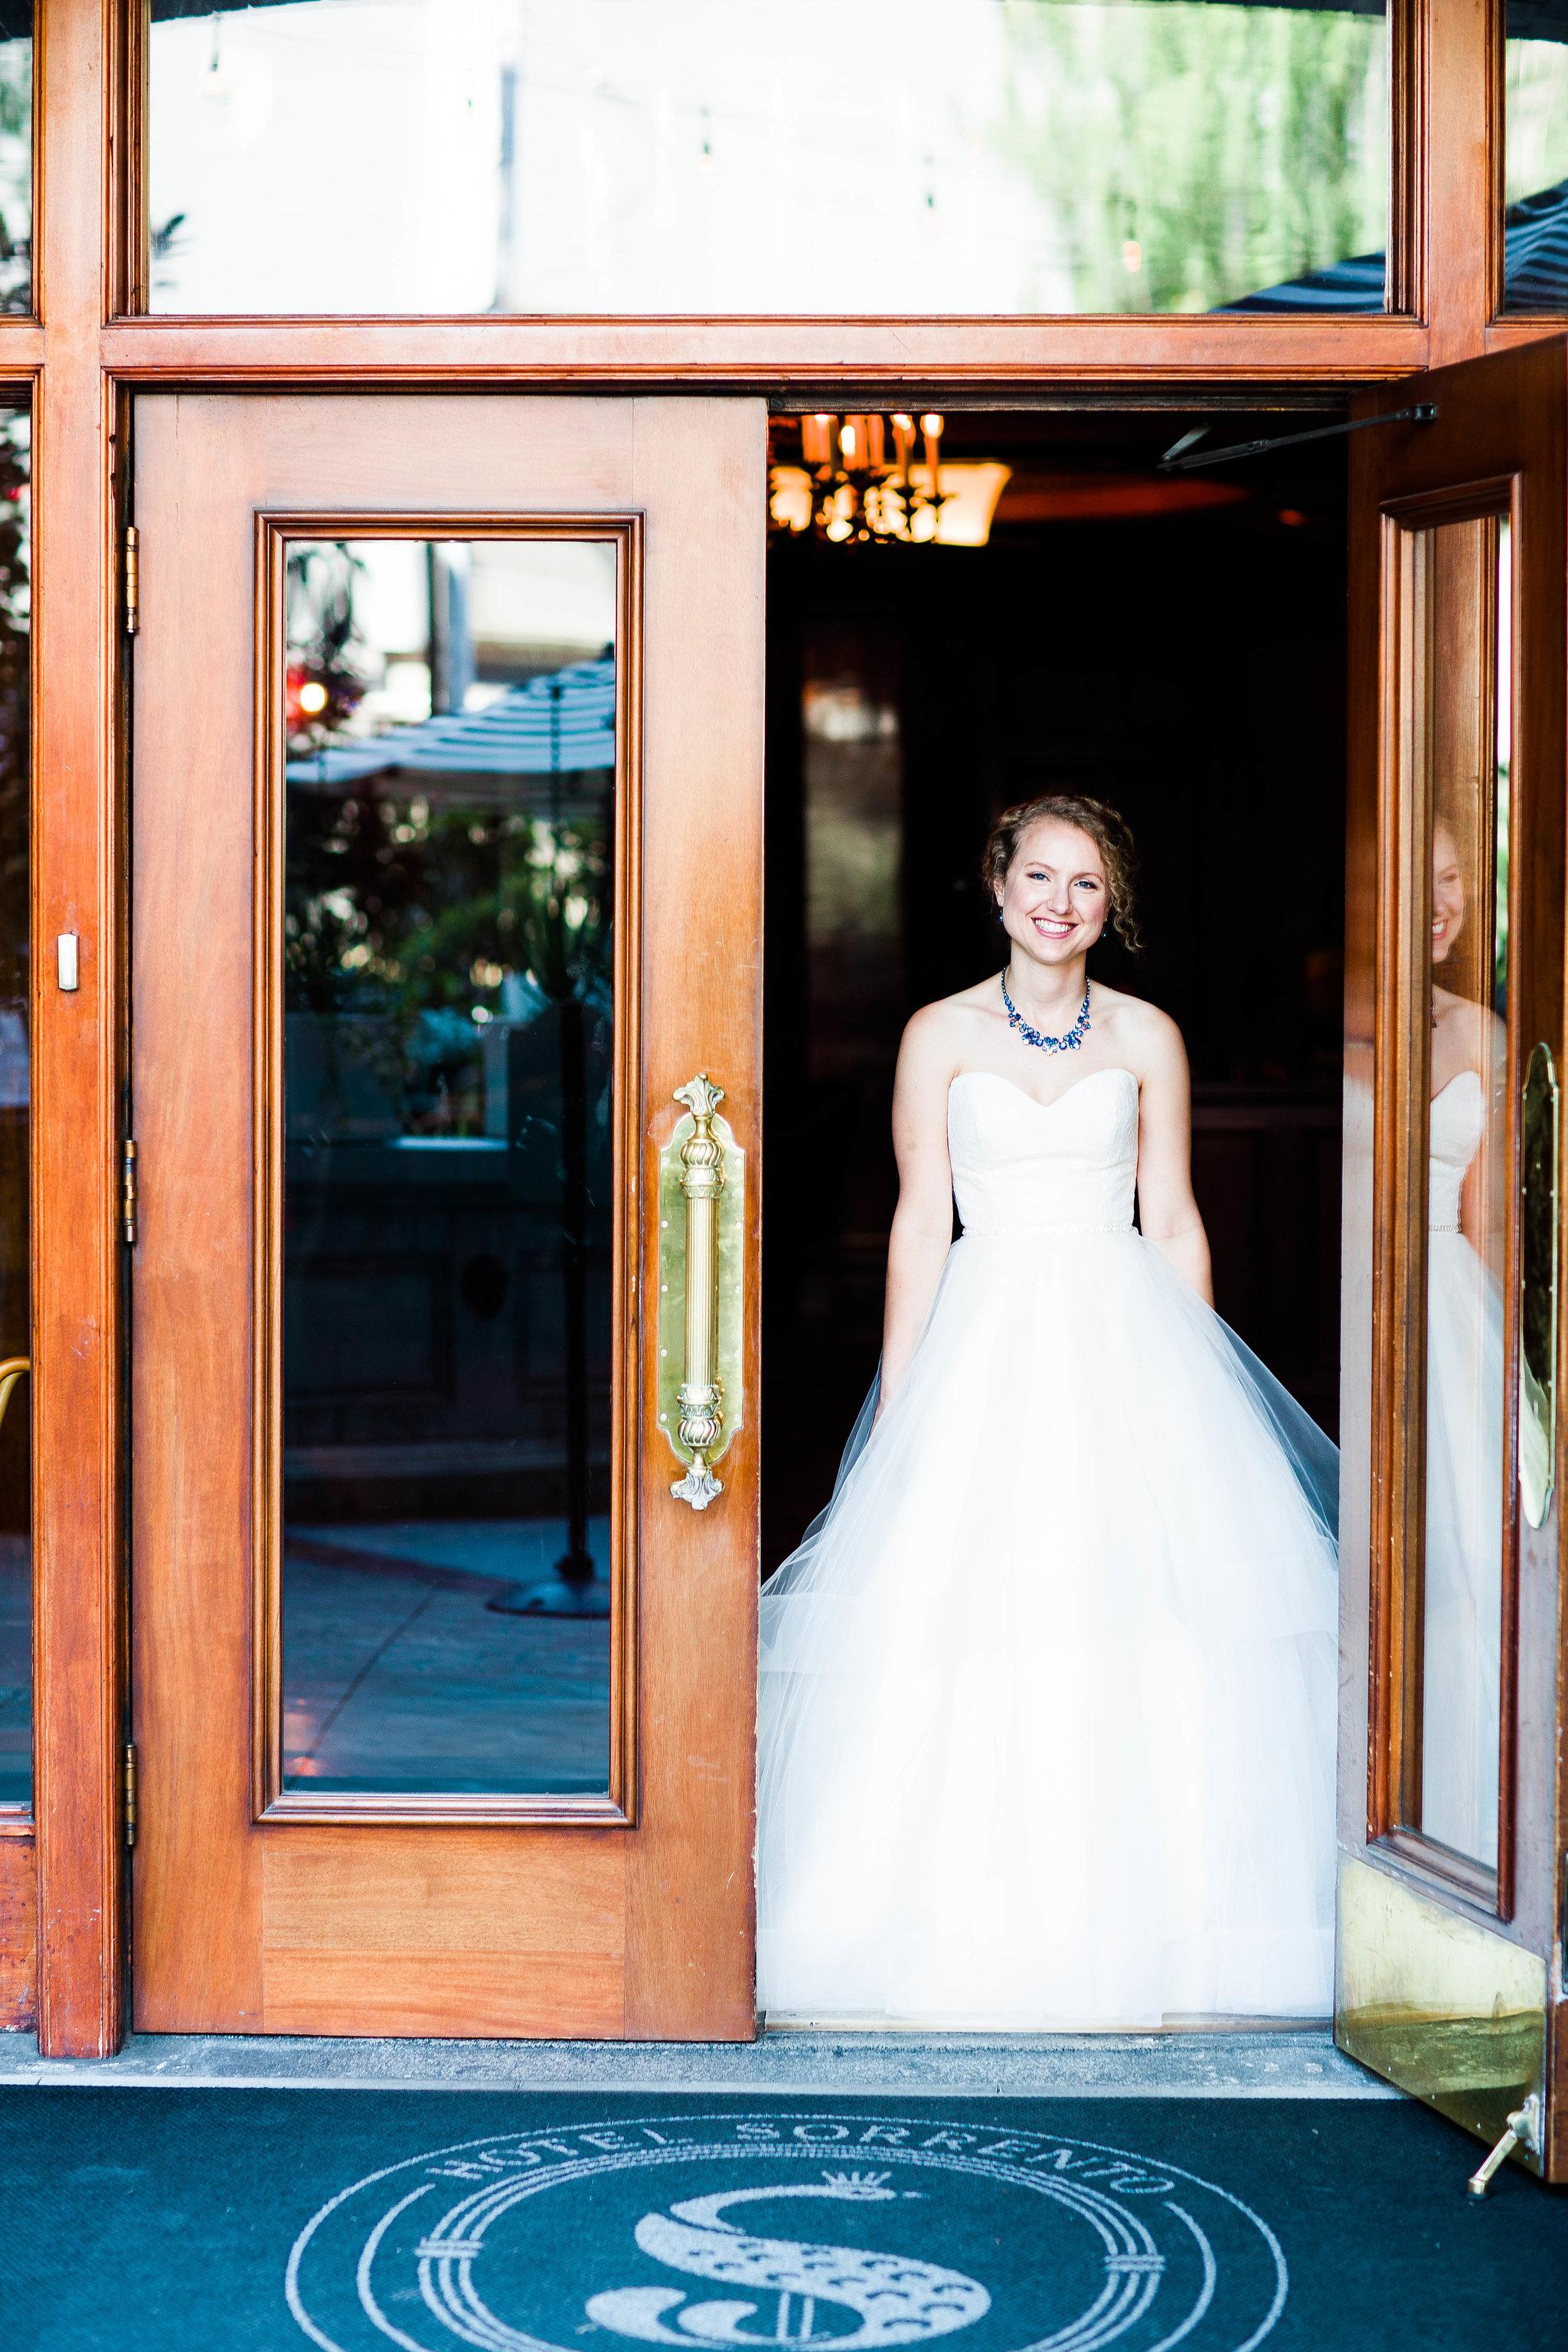 sole-repair-shop-wedding-capitol-hill-by-seattle-wedding-photographer-adina-preston-6.jpg